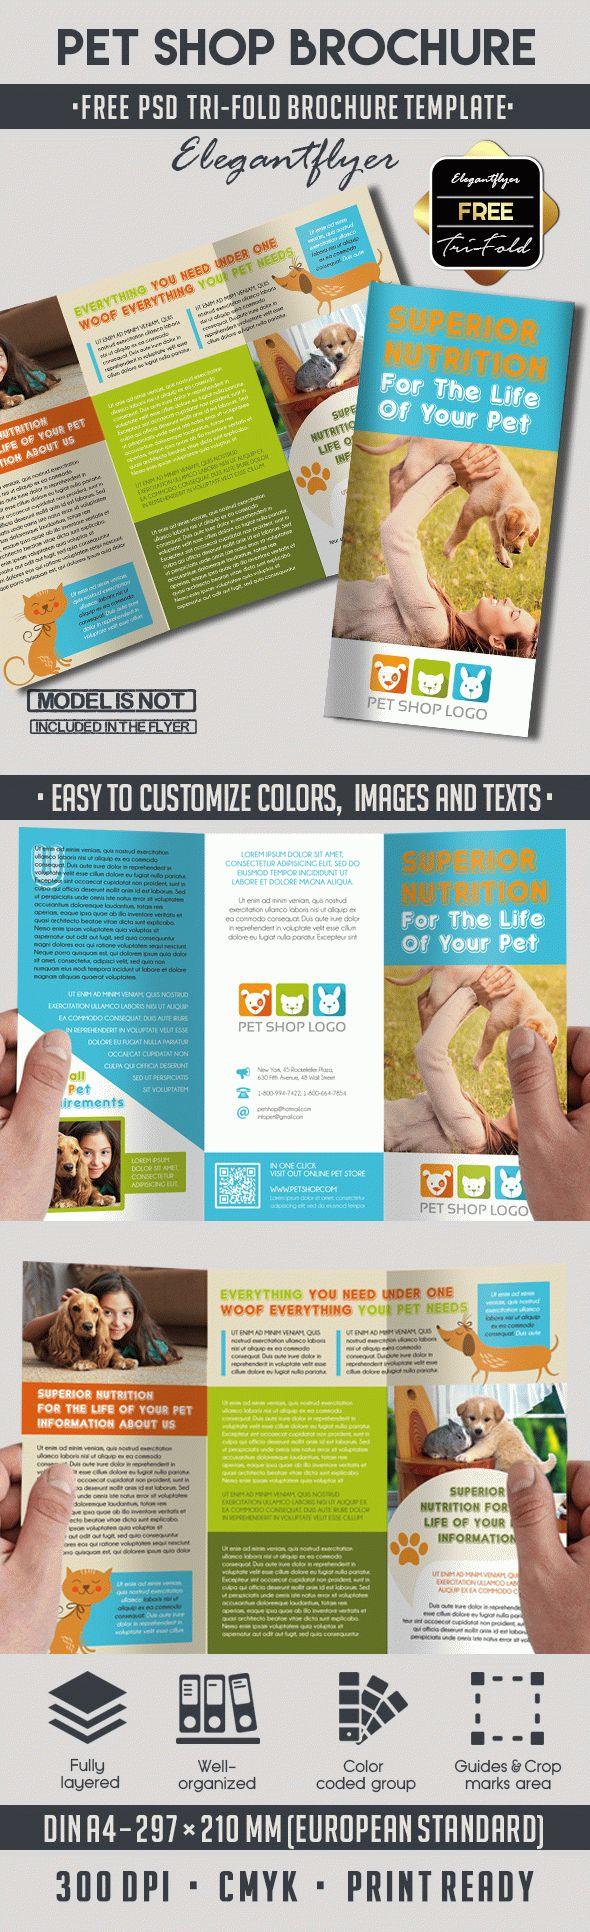 Pet Shop Free Psd Tri Fold Psd Brochure Template Brochure